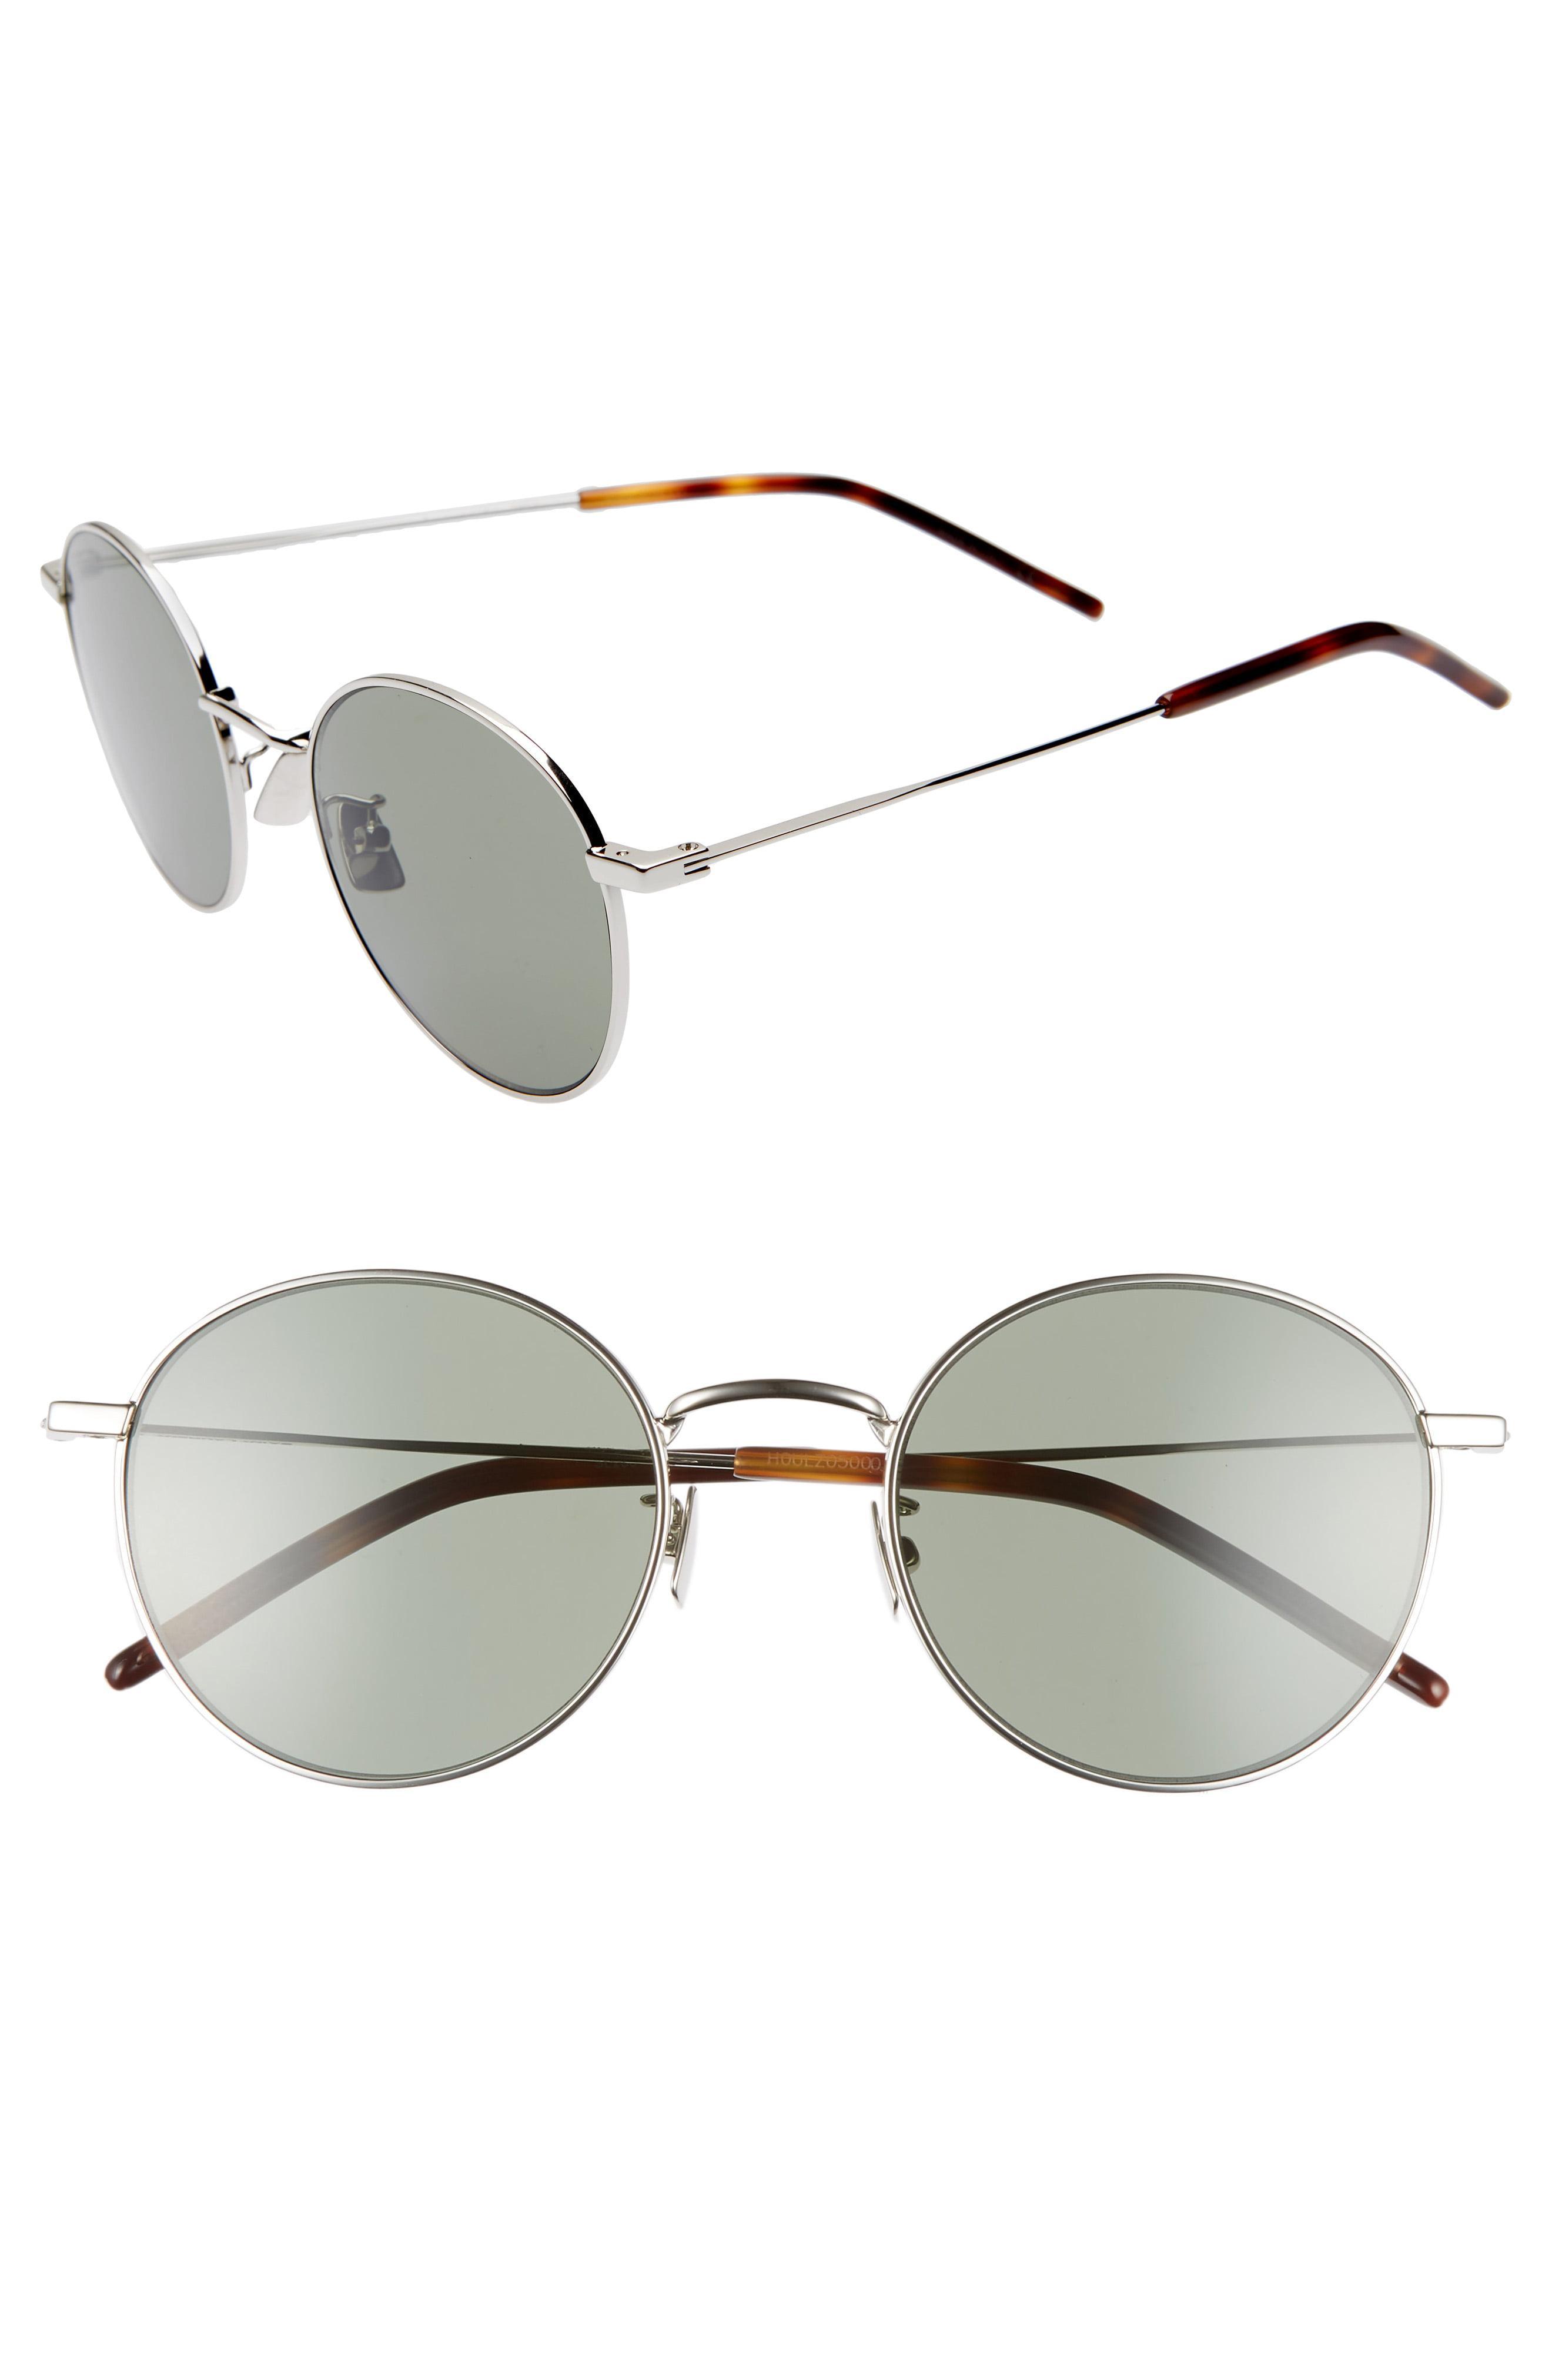 a55c5906a89b2 Lyst - Saint Laurent Sl 250 52mm Sunglasses in Black for Men